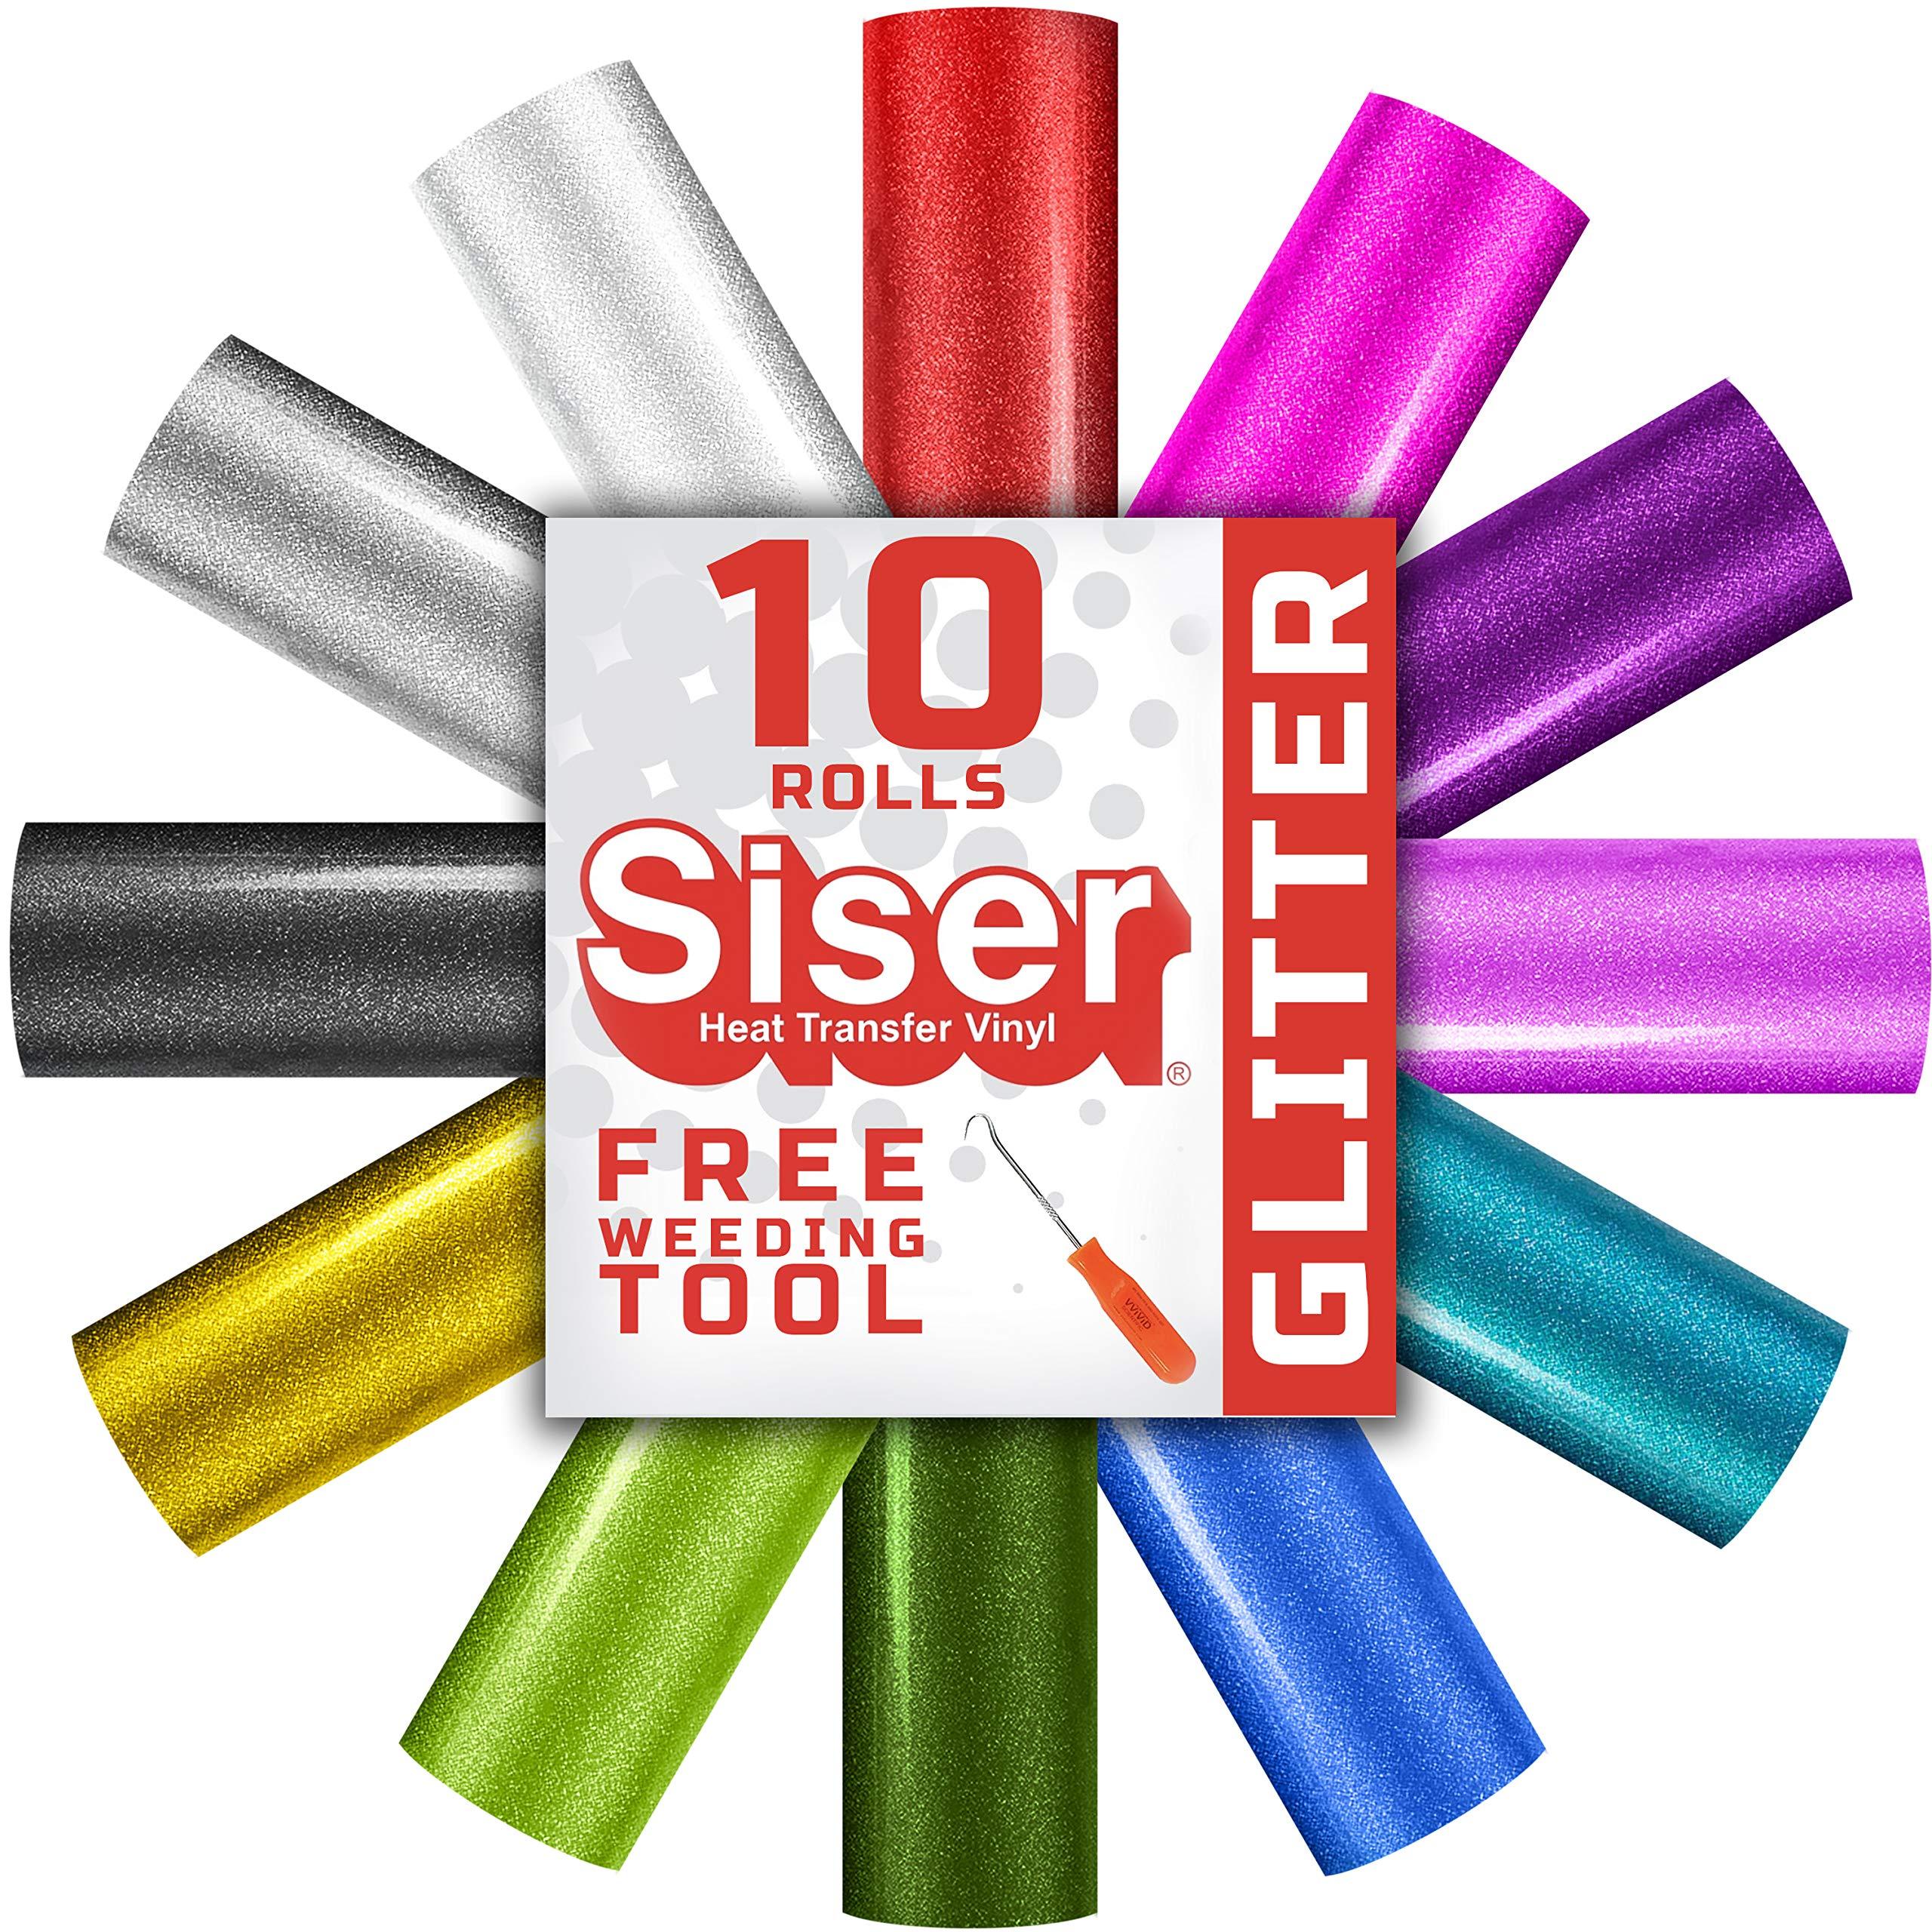 Siser Easyweed Glitter Heat Transfer Vinyl 10-Sheet Multi-Color 12'' x 20'' Roll Bundle Including Free Weeding Tool - Choose Your Own Custom Colors!